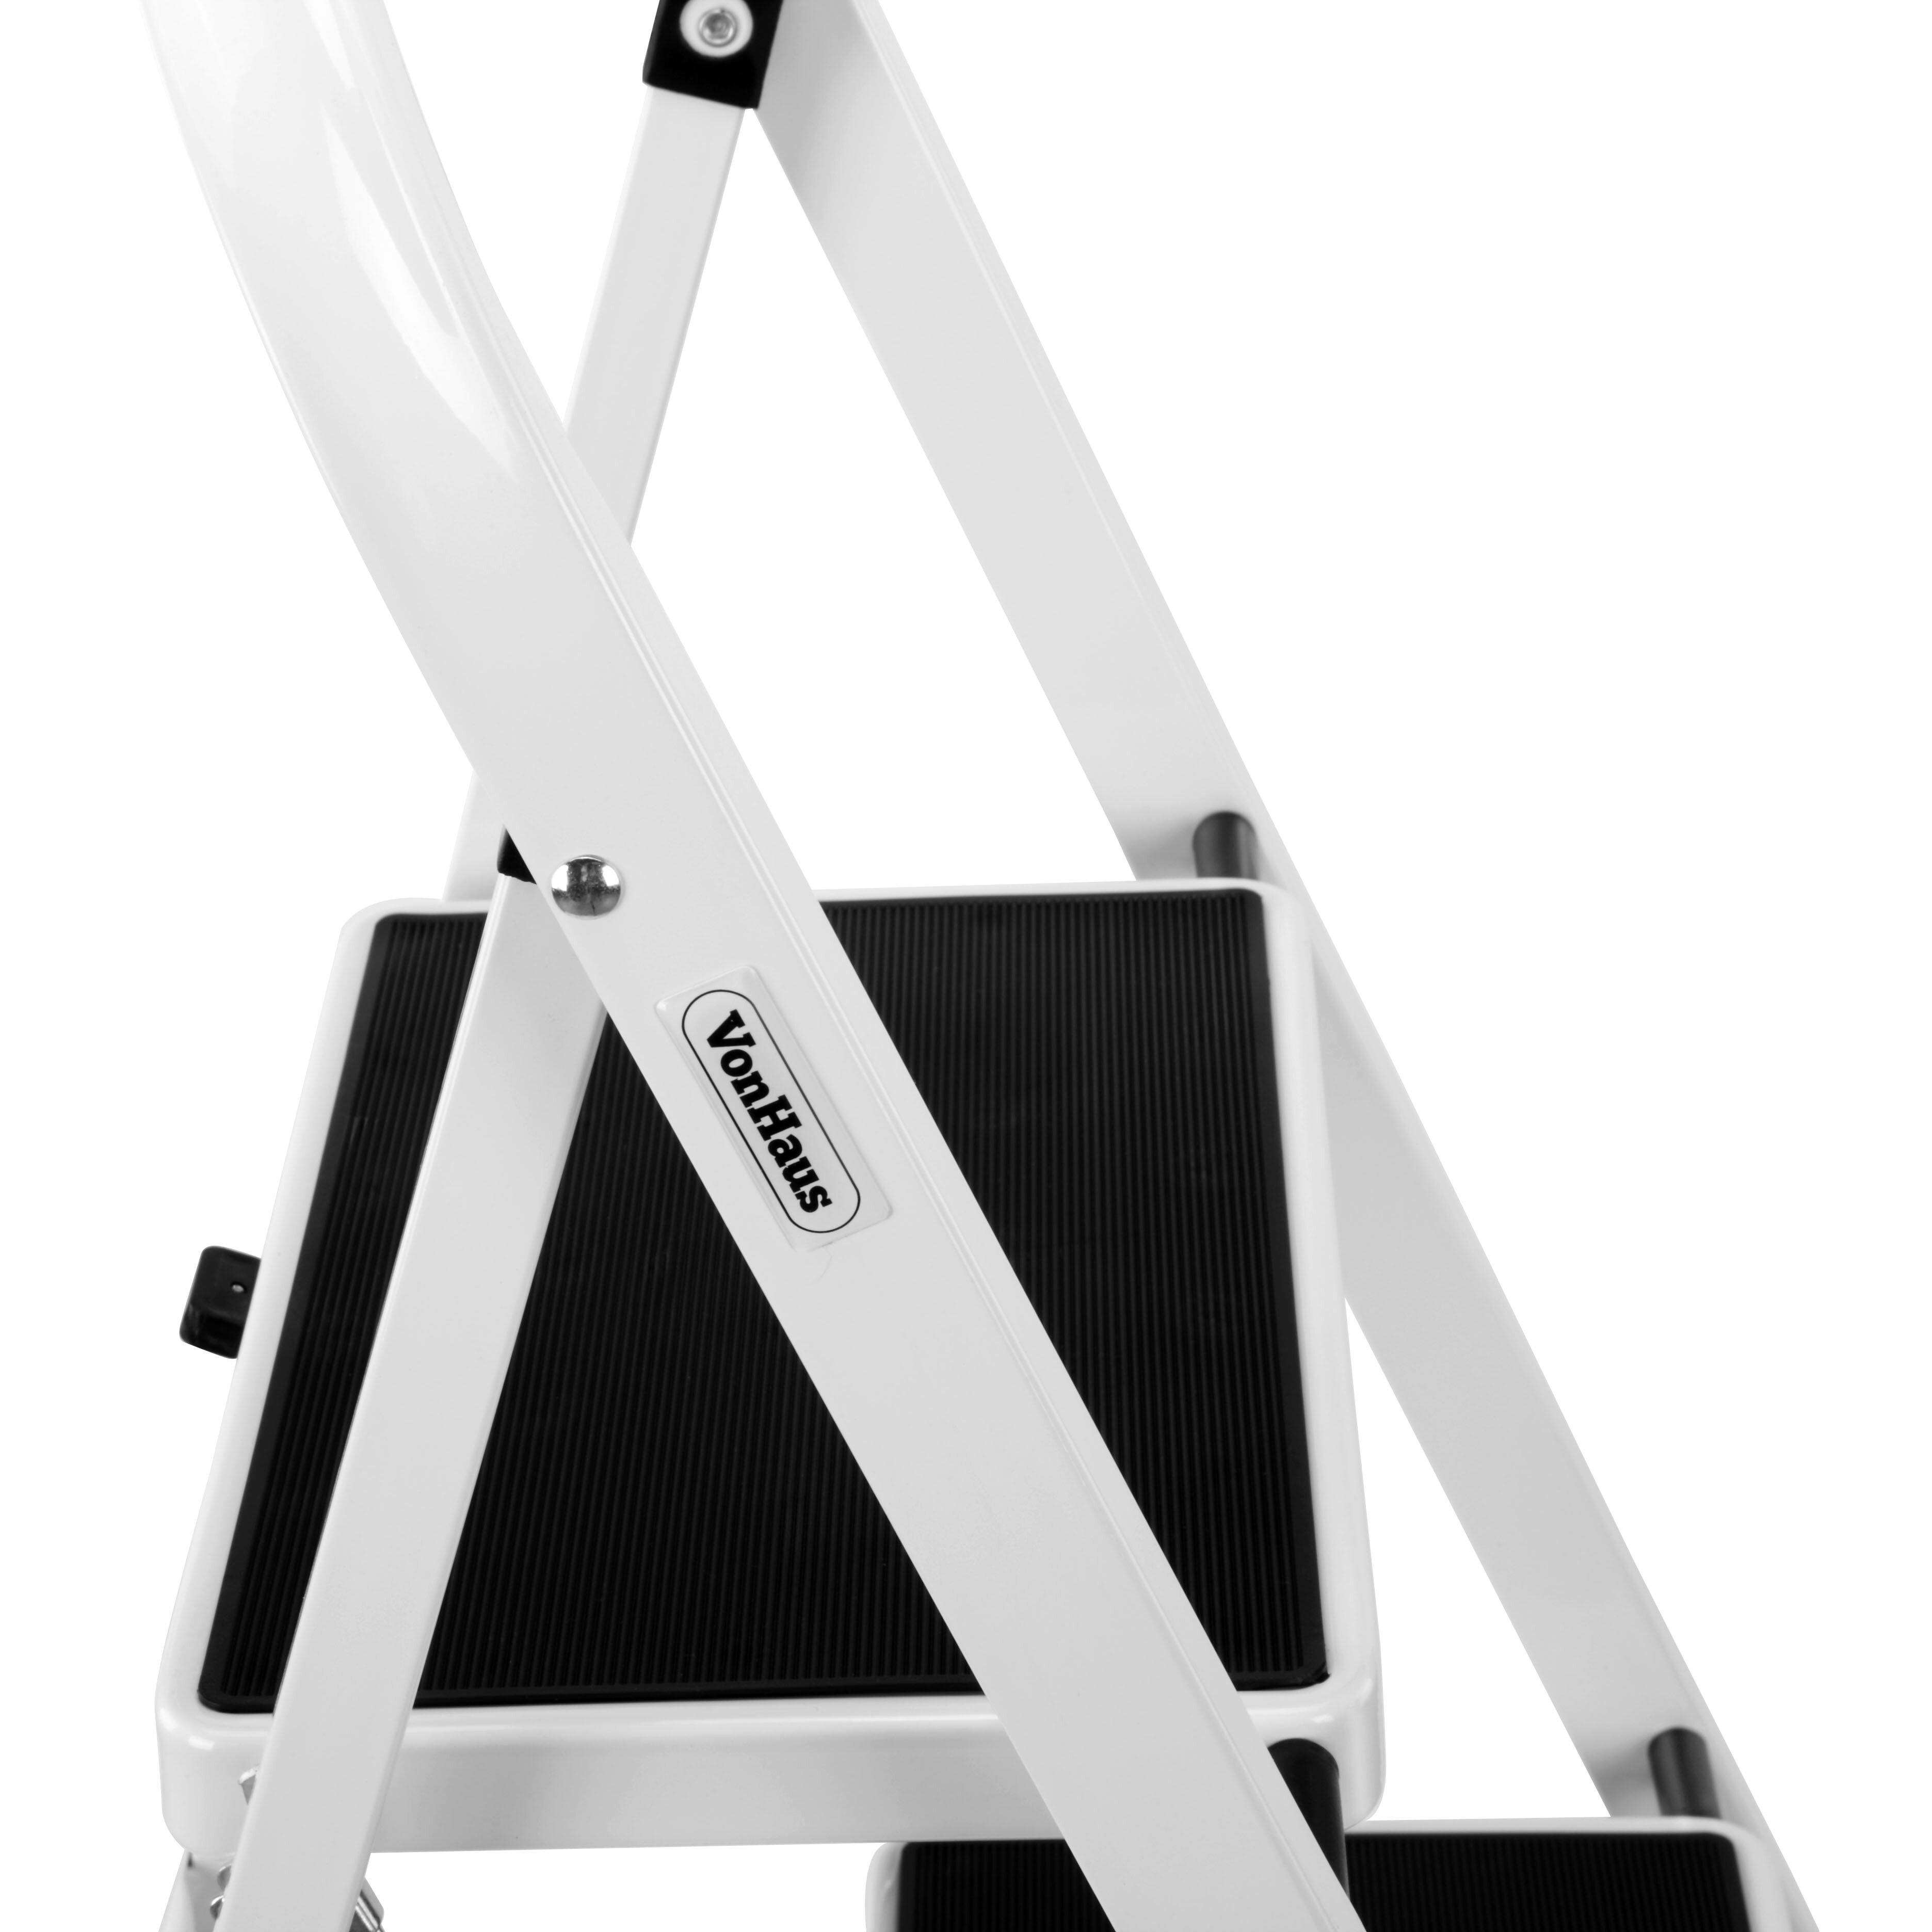 4 Step Steel Step Stool 300 Lb Load Capacity Wayfair Ca